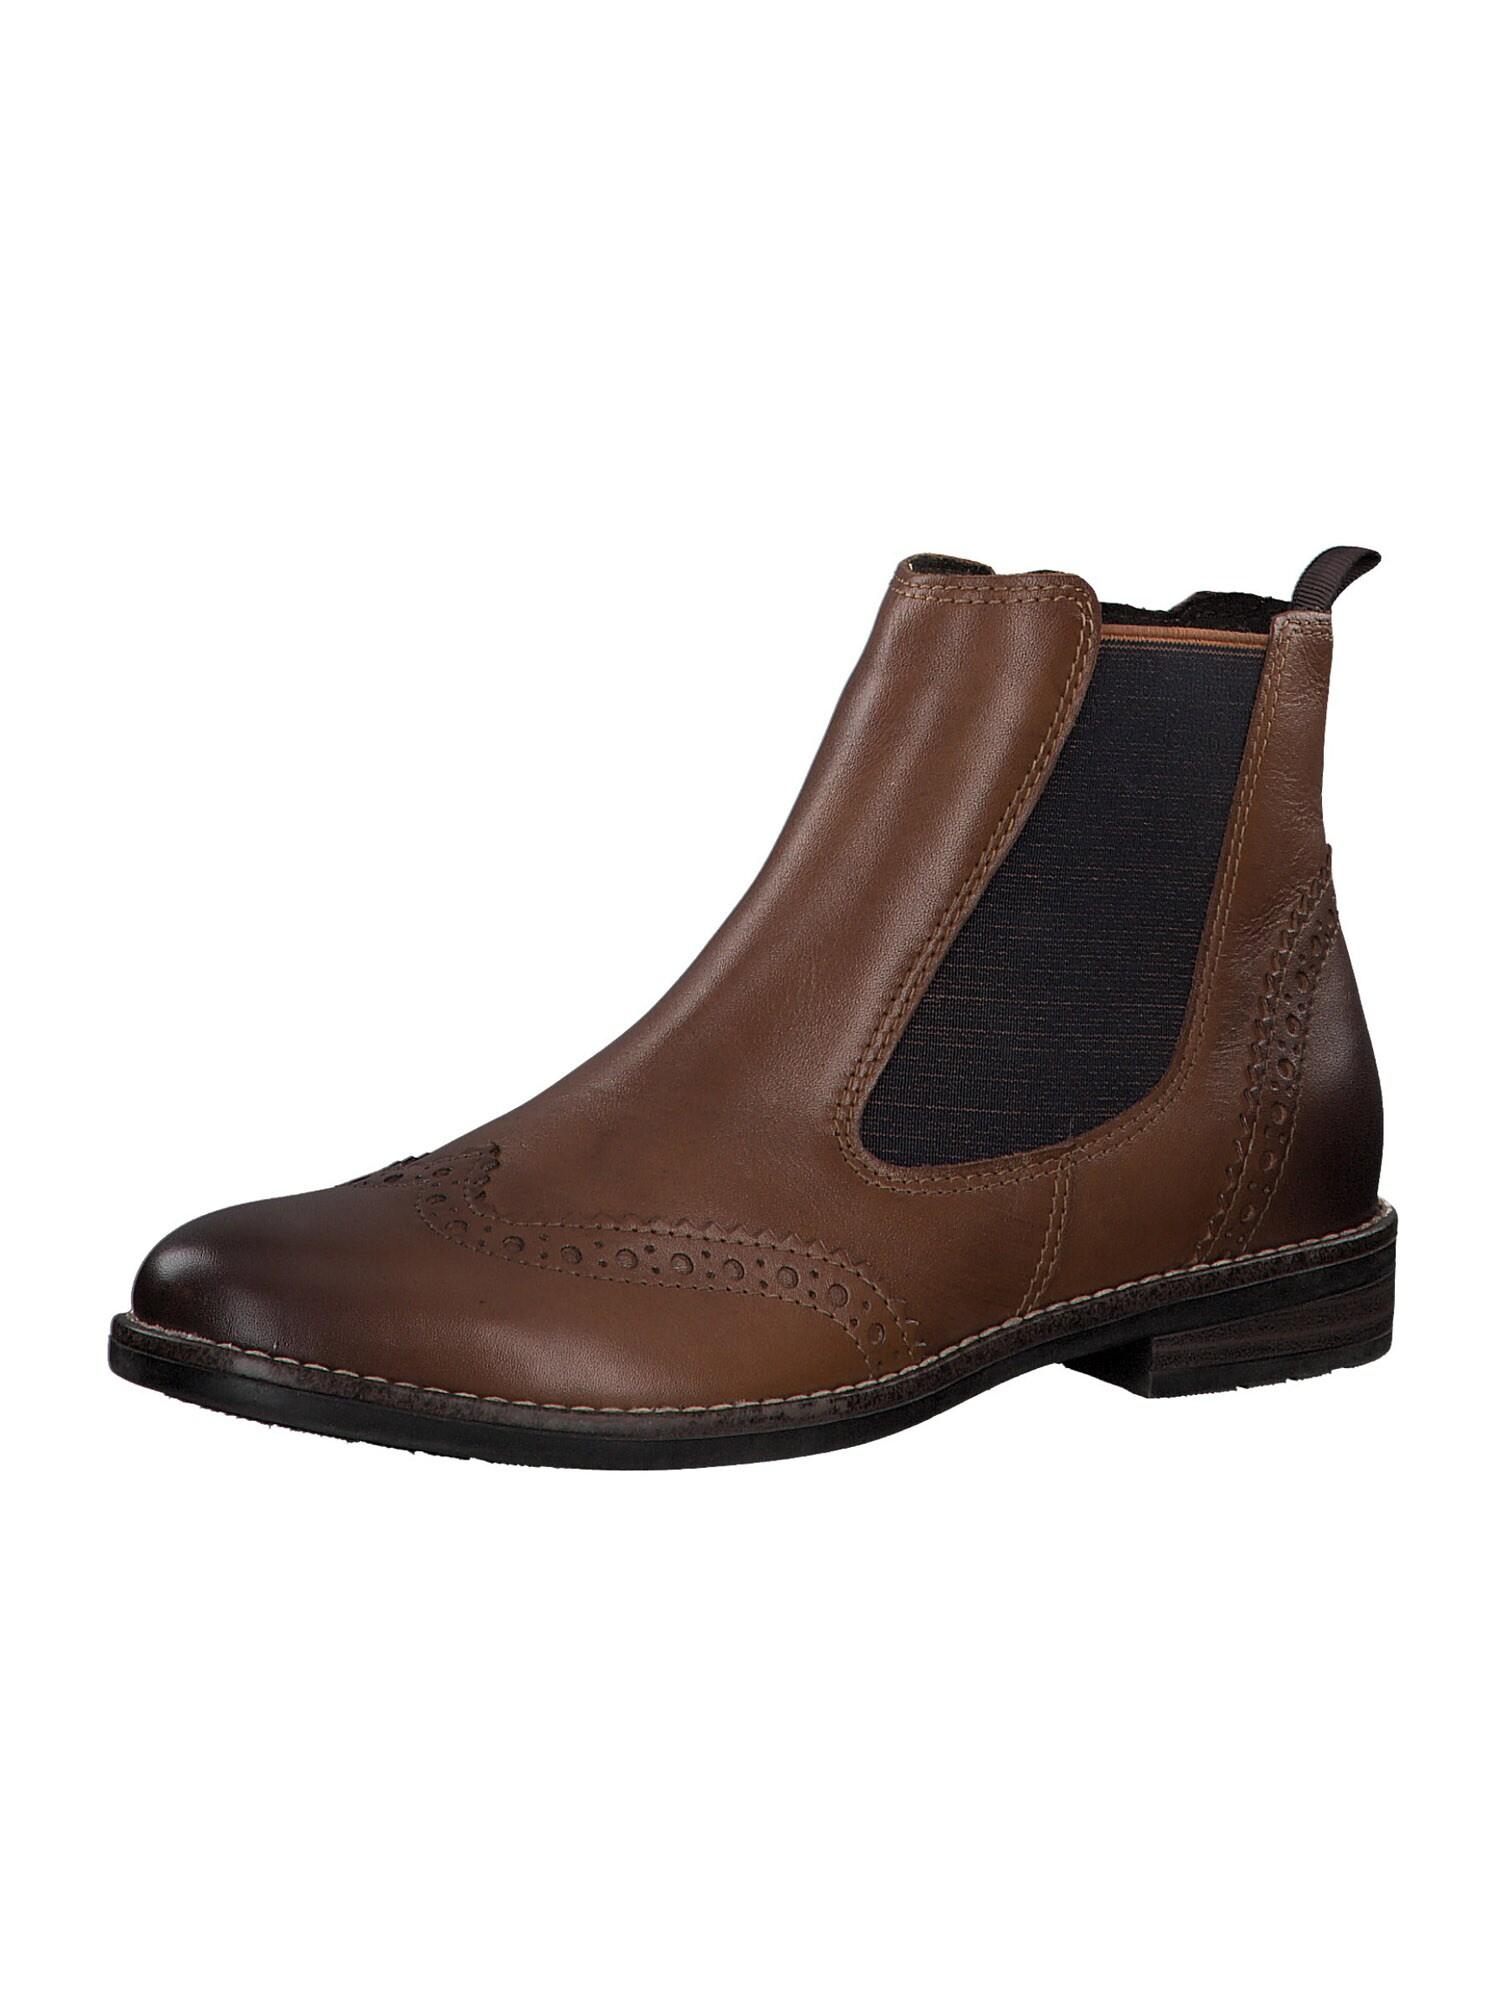 MARCO TOZZI Chelsea batai ruda / garstyčių spalva